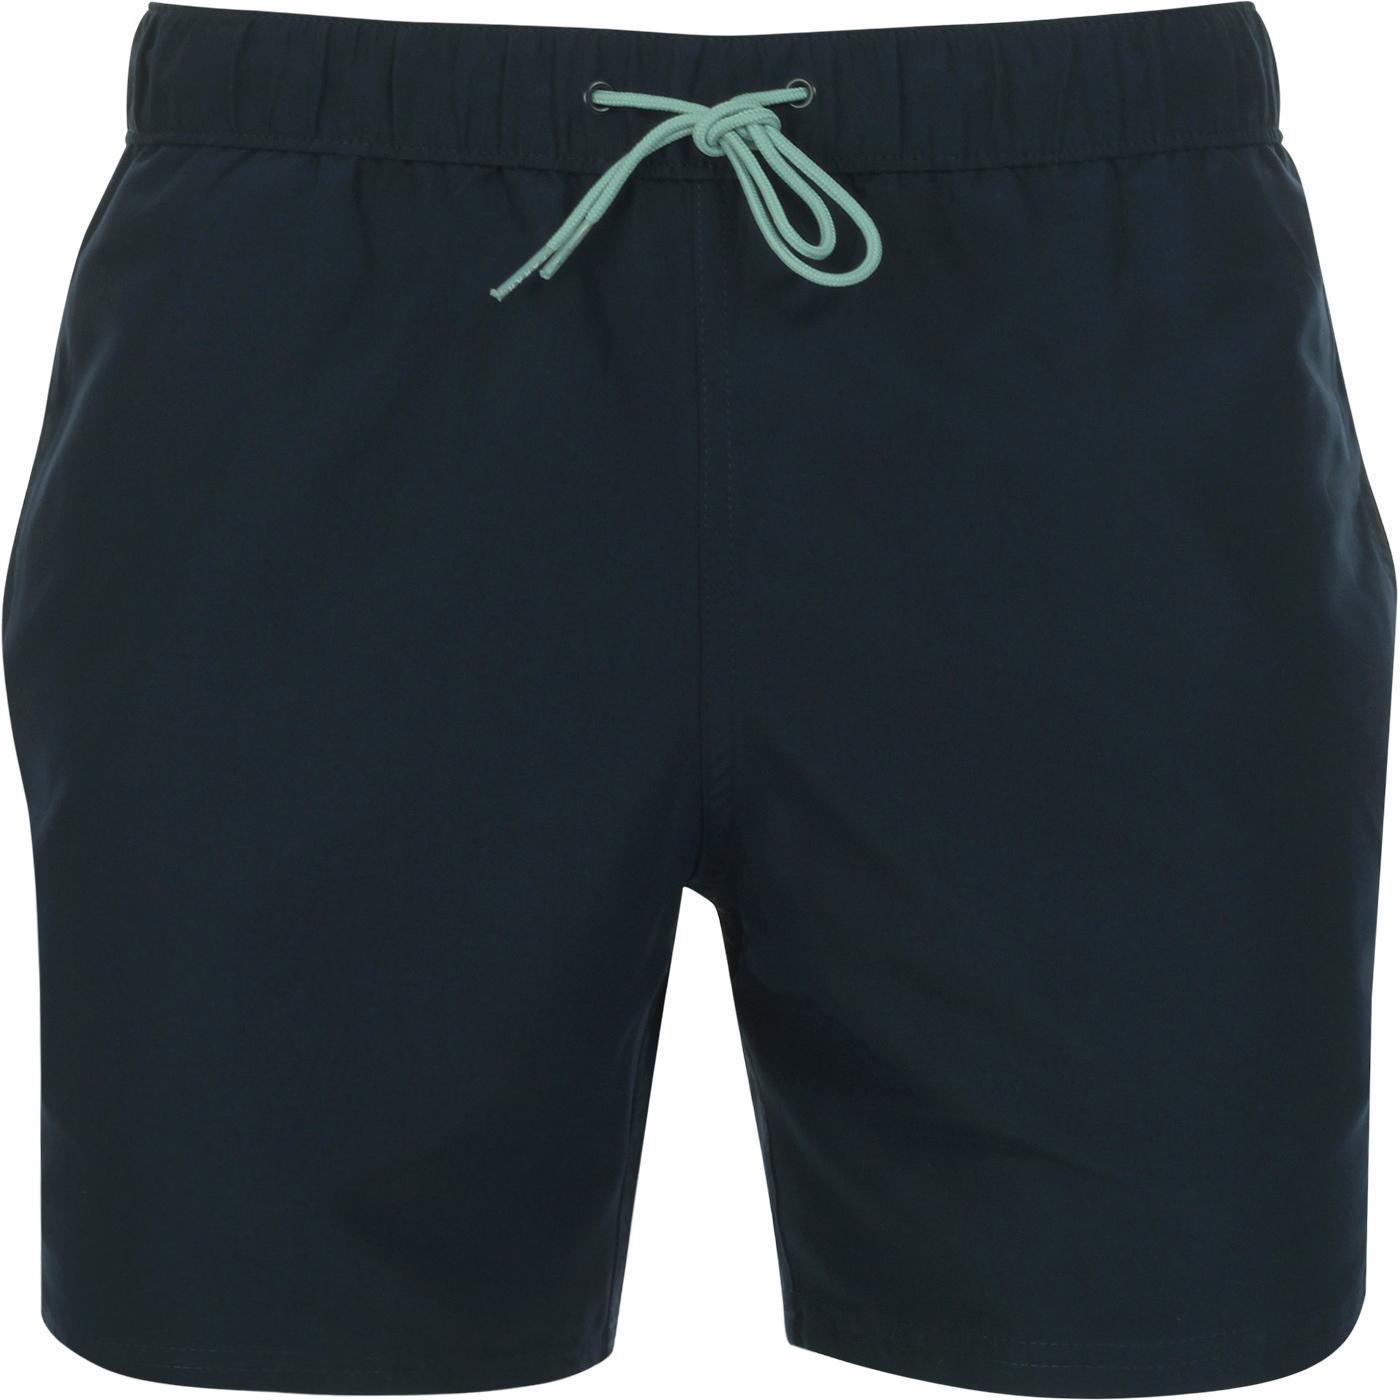 Colbert FARAH Retro Indie Plain Swim Shorts Yale